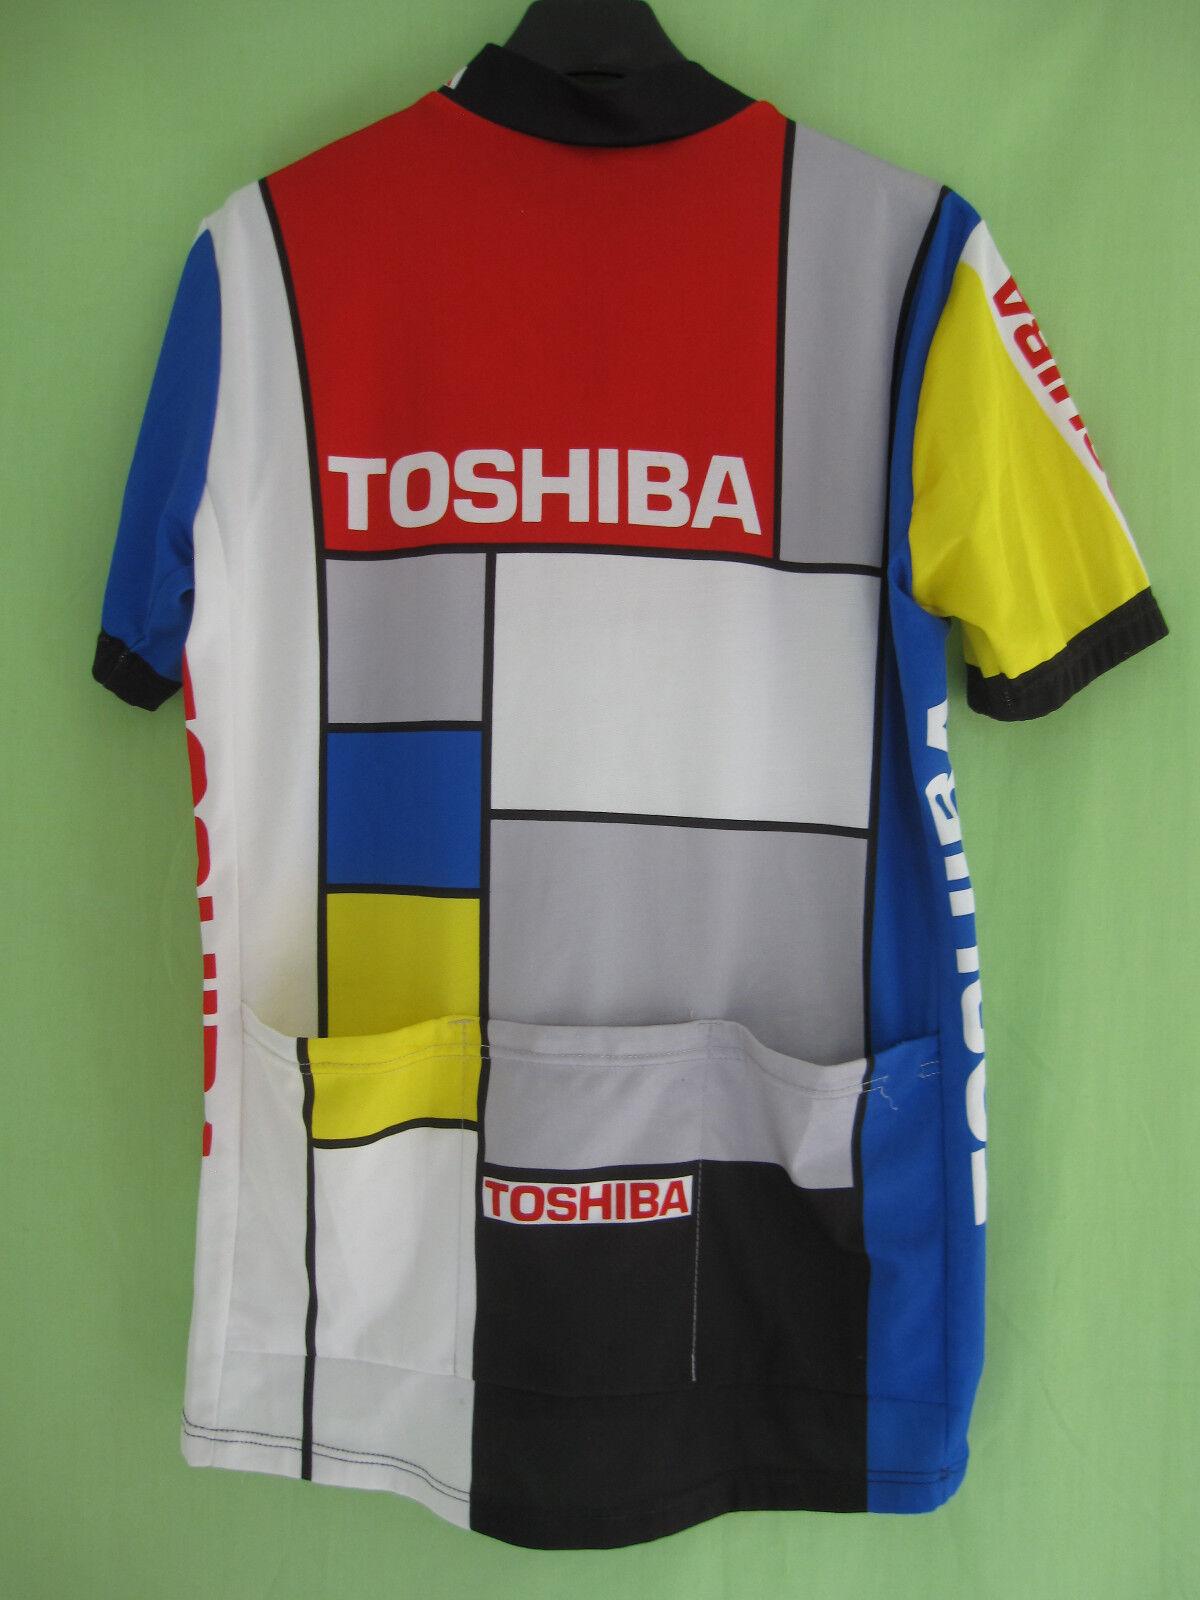 Maillot Tour cycliste Toshiba Tour Maillot Pro 1989 ASSOS Vintage Jersey Cycling - XL 0fe162